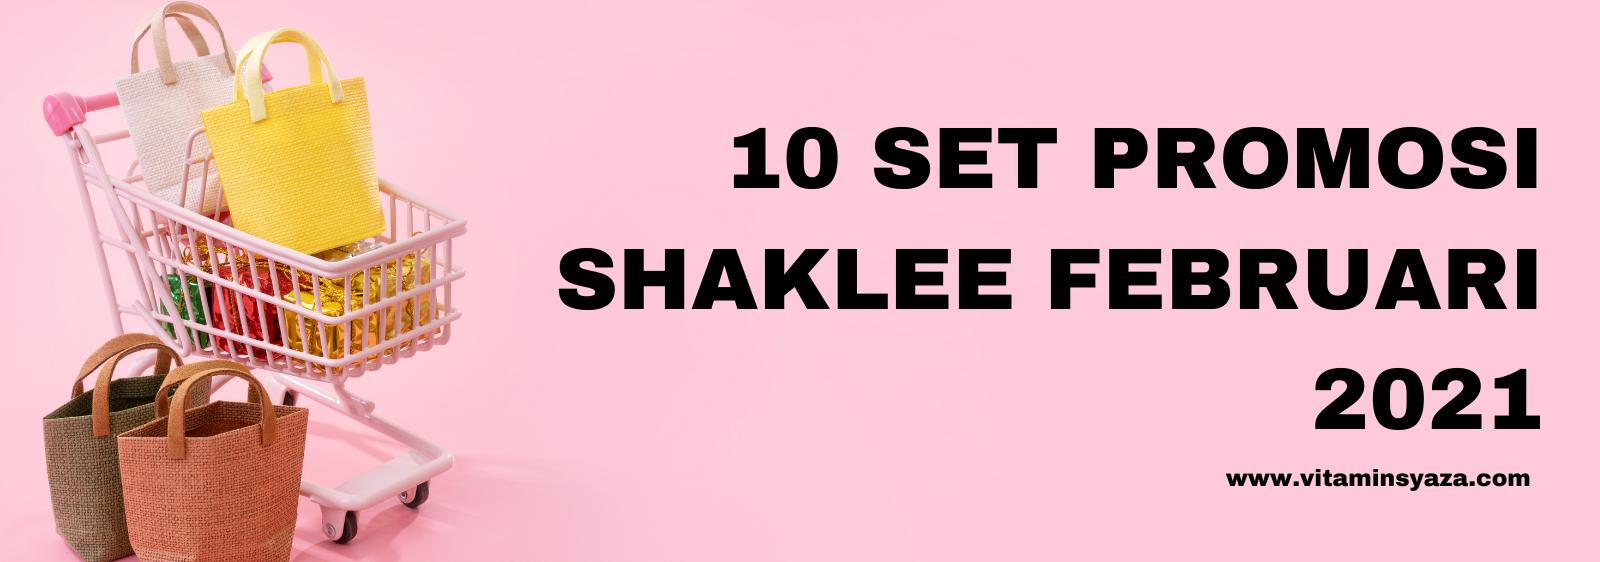 promosi shaklee februari 2021